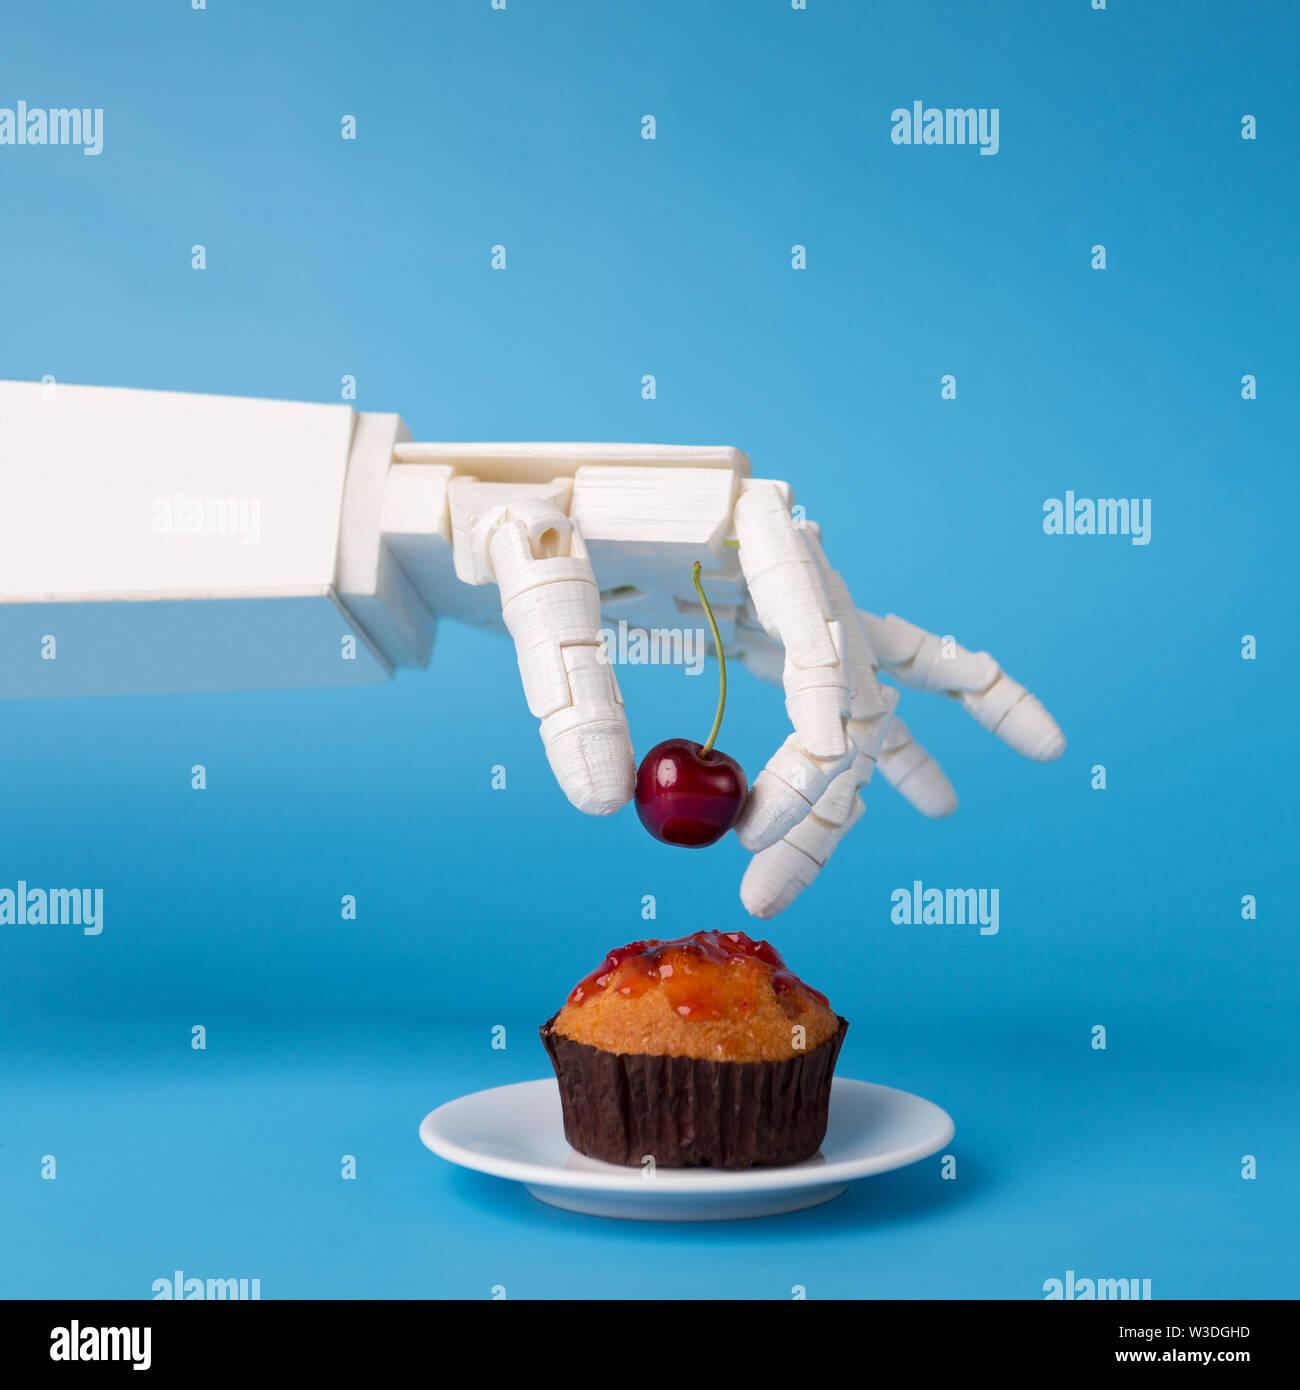 Robot hand decorating sweet cupcake with fresh cherry - Stock Image